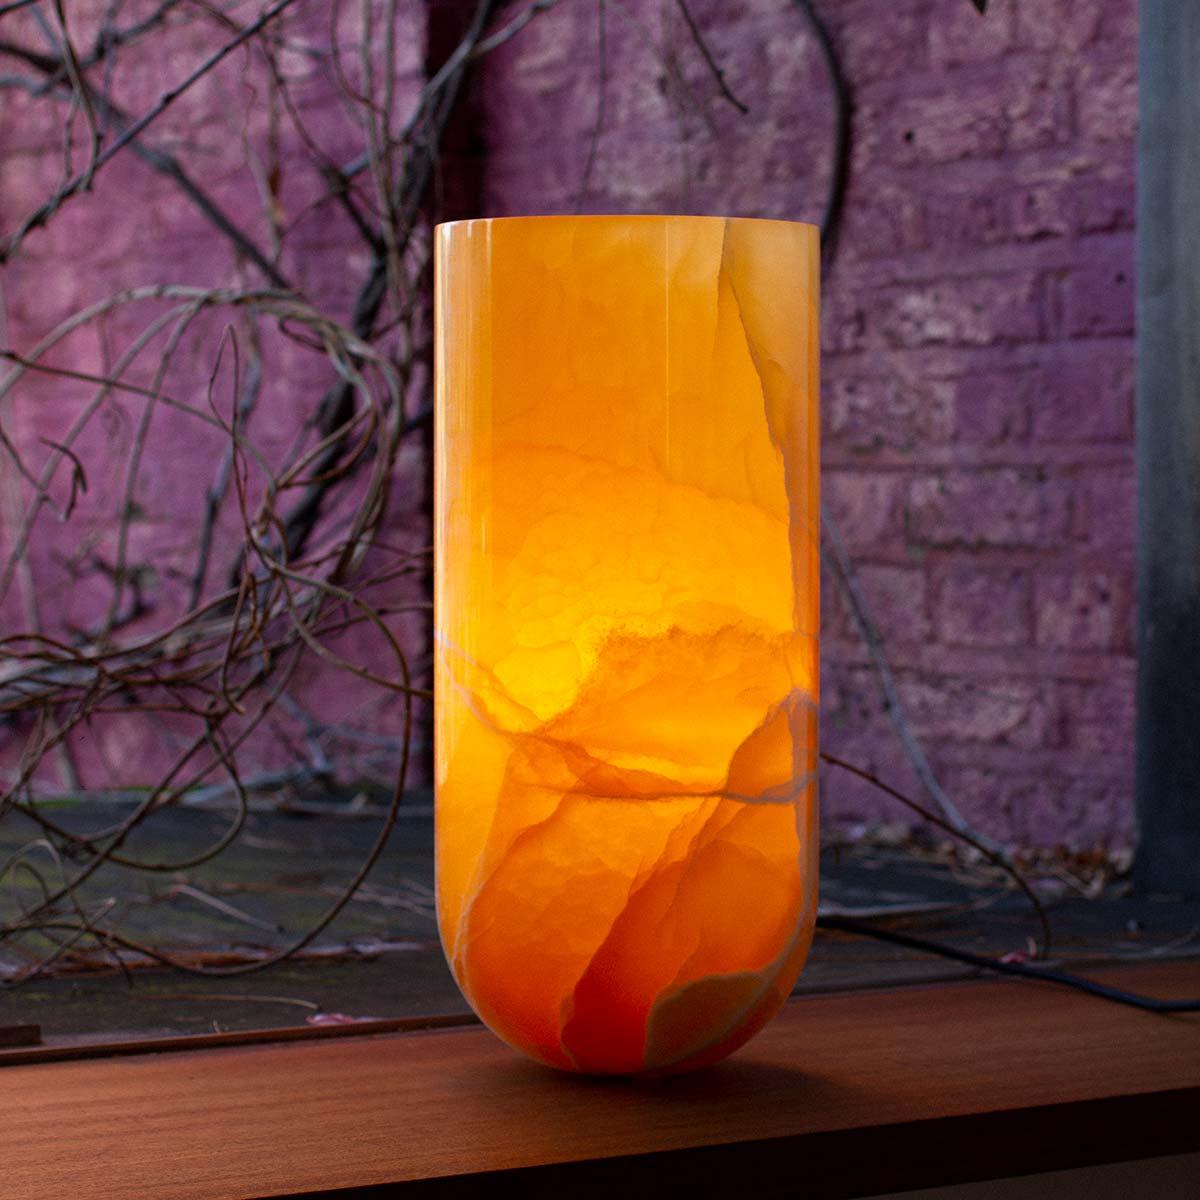 The Onyx Light by Michael Anastassiades